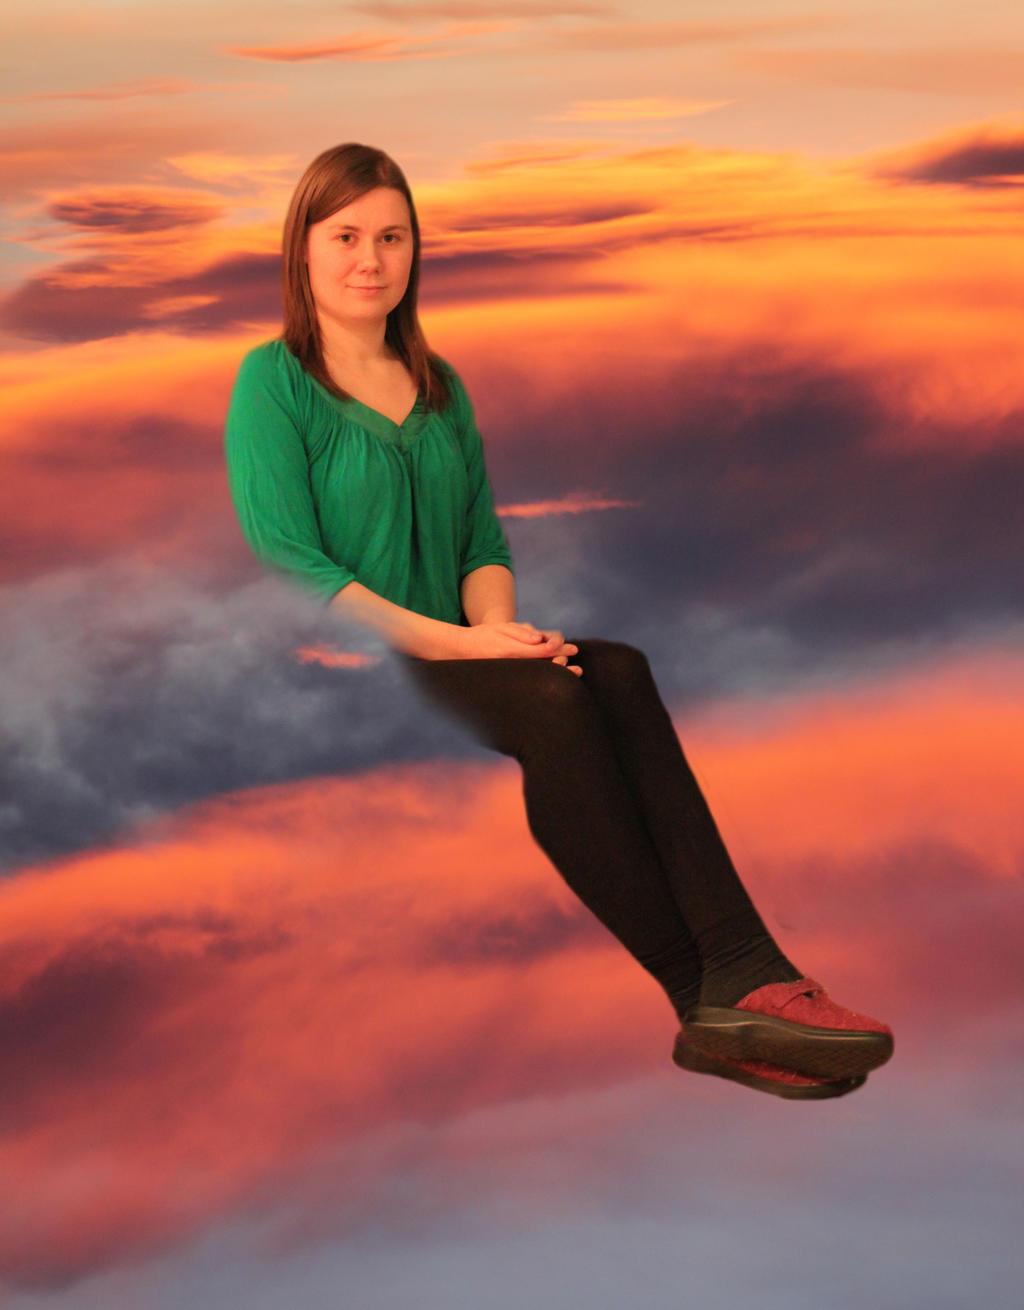 Polarliger, artista de DeviantART Like_sitting_on_clouds_by_polarliger-d5x9n2v